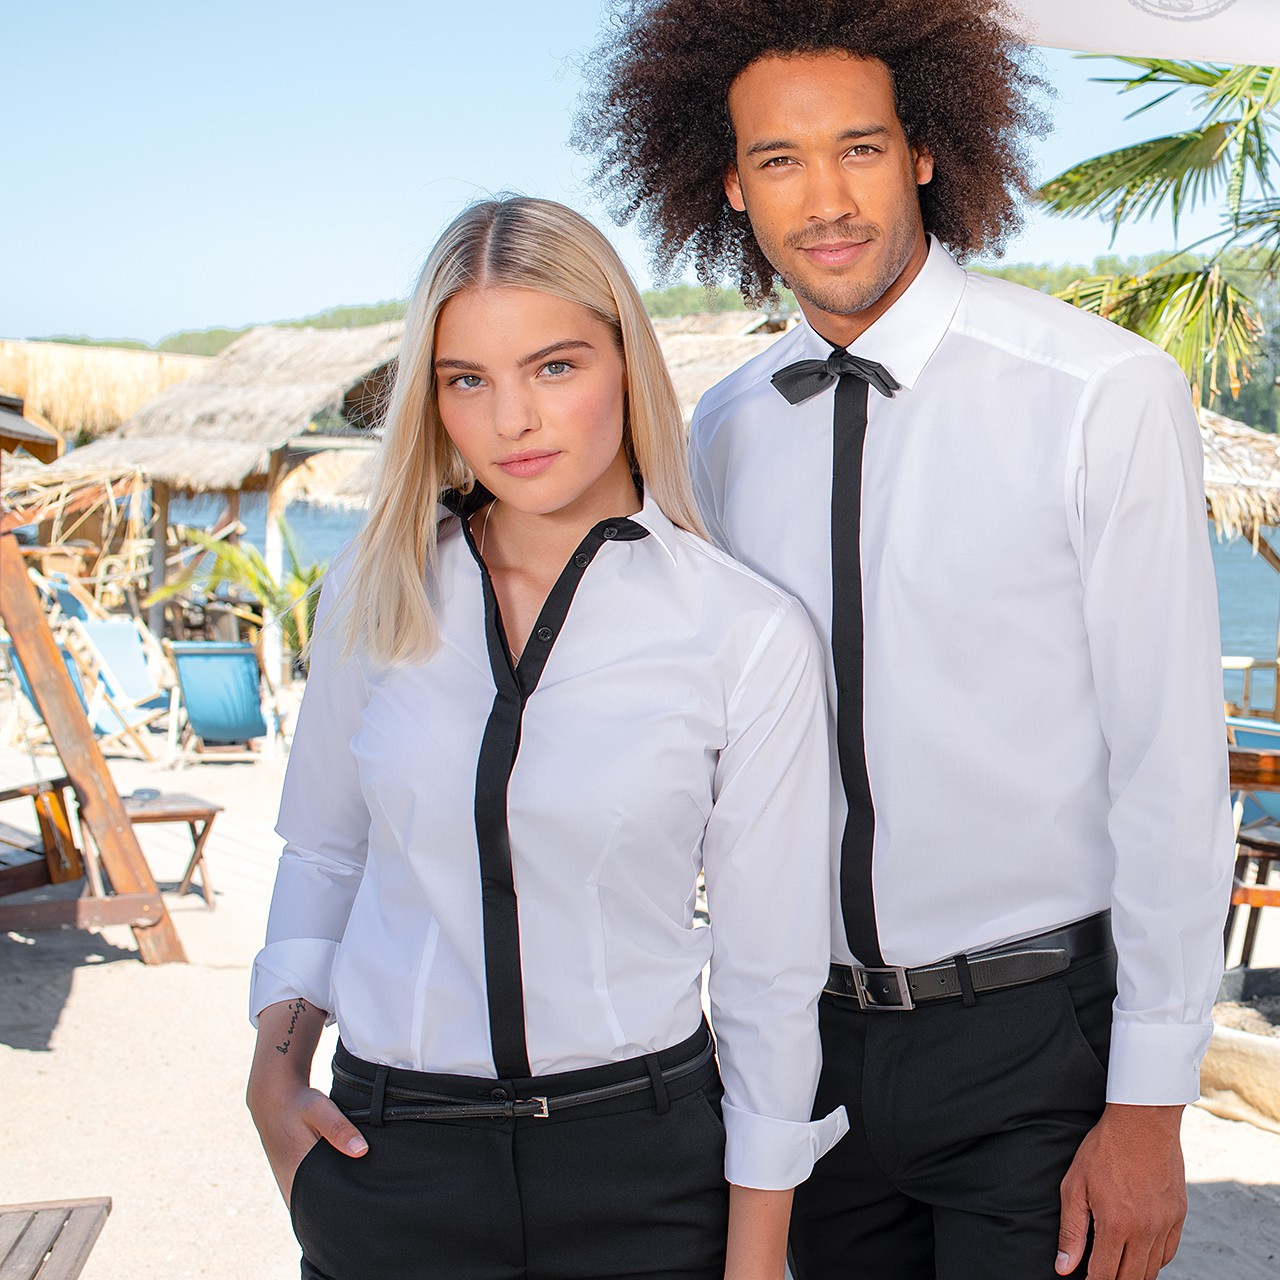 Damen-Bluse Kontrast 1/1 RF Service Greiff® | bedrucken, besticken, bedrucken lassen, besticken lassen, mit Logo |